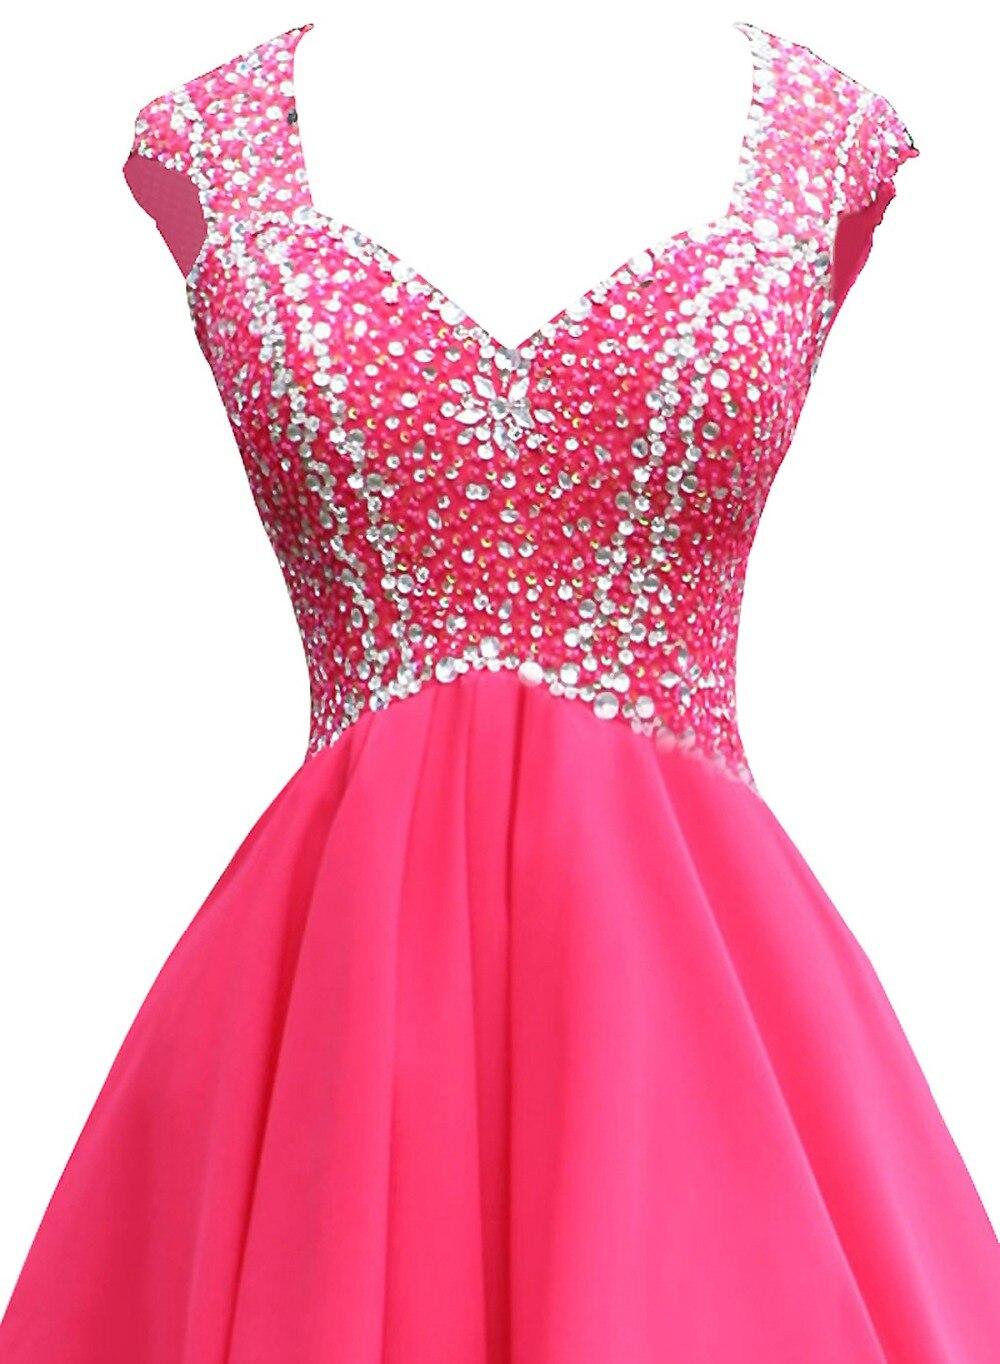 Popular Hot Pink Sequin Cocktail Dress-Buy Cheap Hot Pink Sequin ...